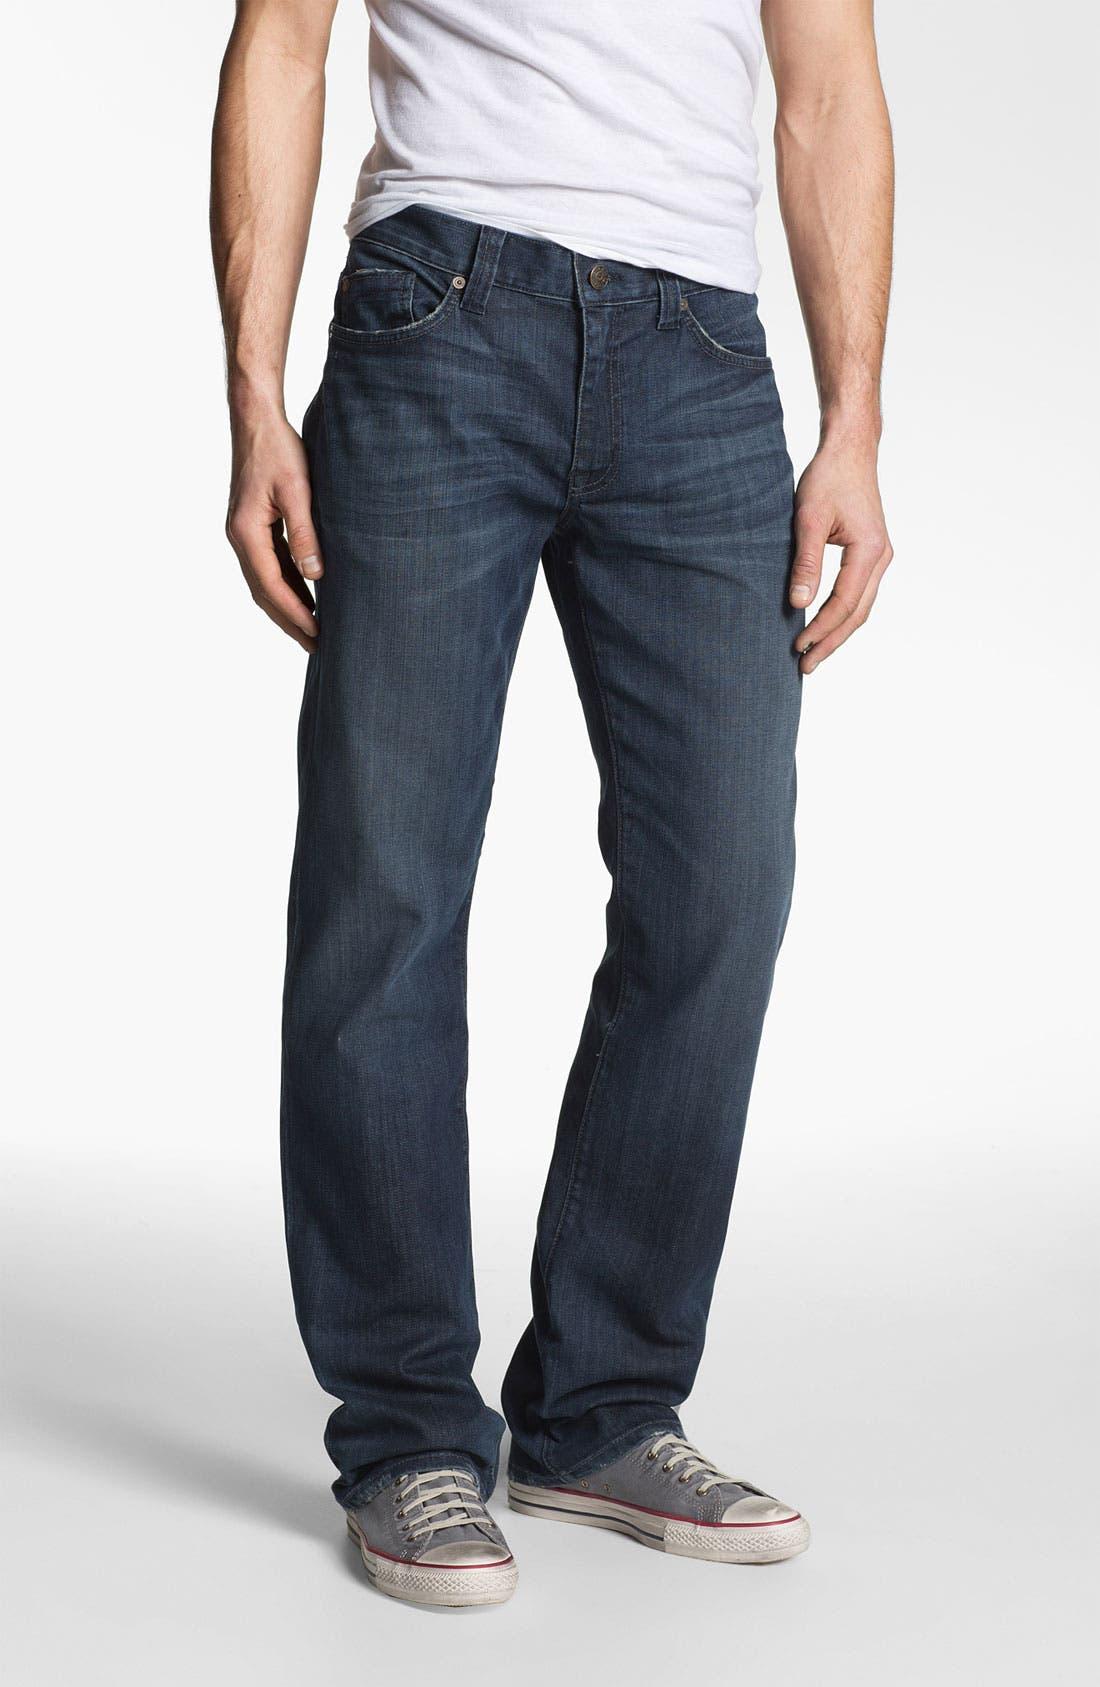 Alternate Image 1 Selected - Fidelity Denim '5011' Straight Leg Jeans (Town Valley Wash)